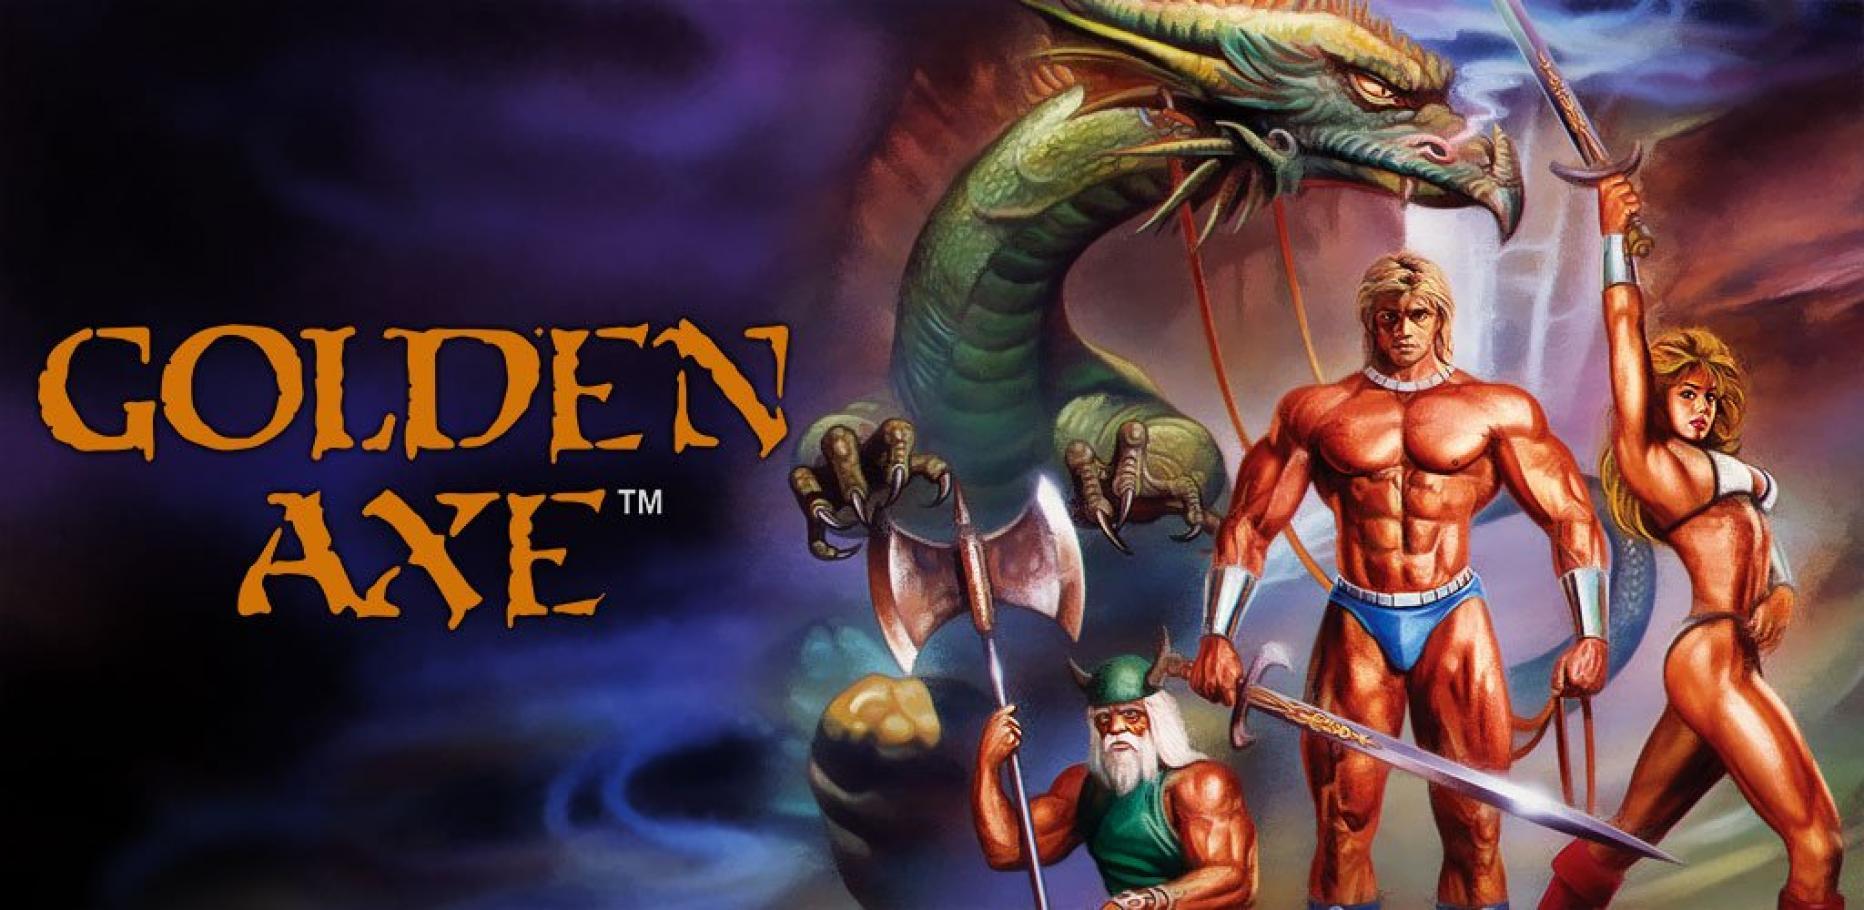 Sega выпустила Golden Axe II и Golden Axe III на мобильные устройства